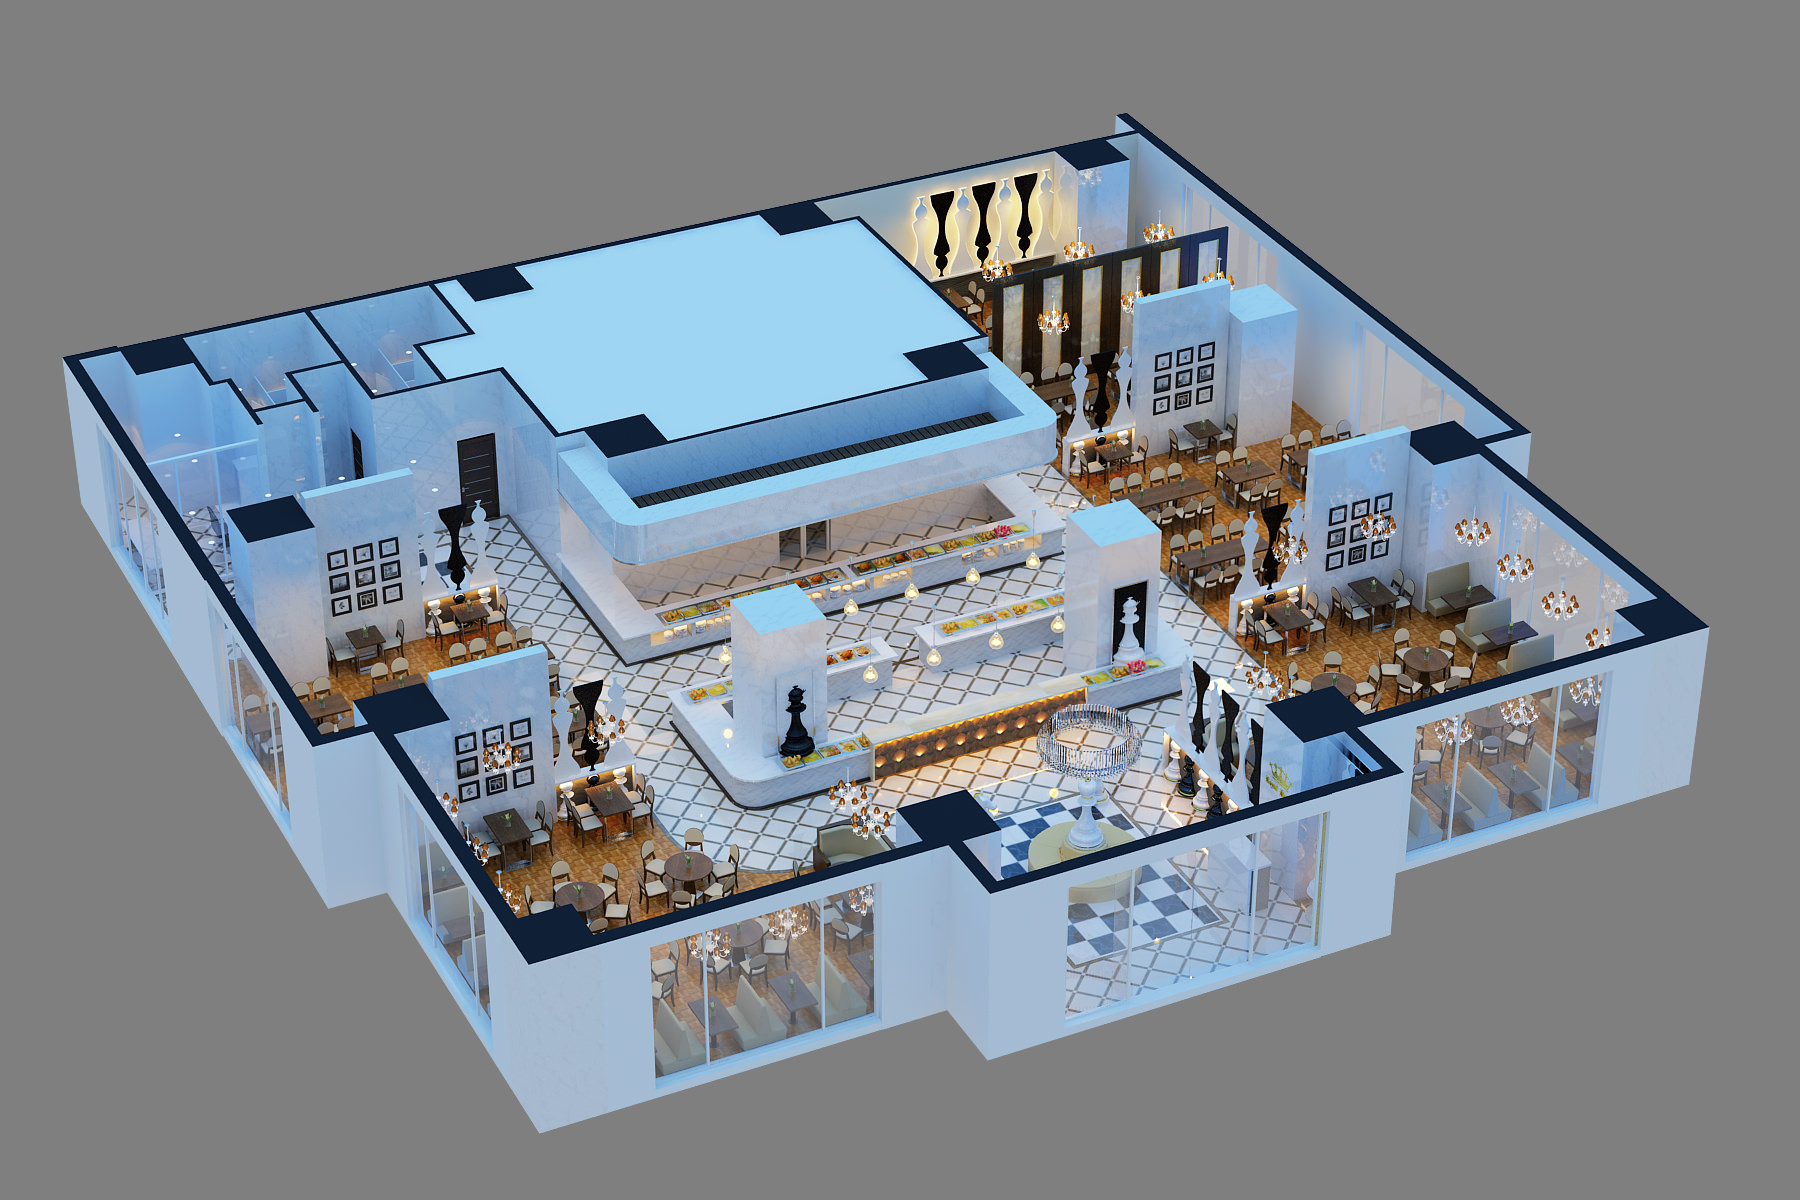 3D Models Chess Restaurant 3D Model .max - CGTrader.com